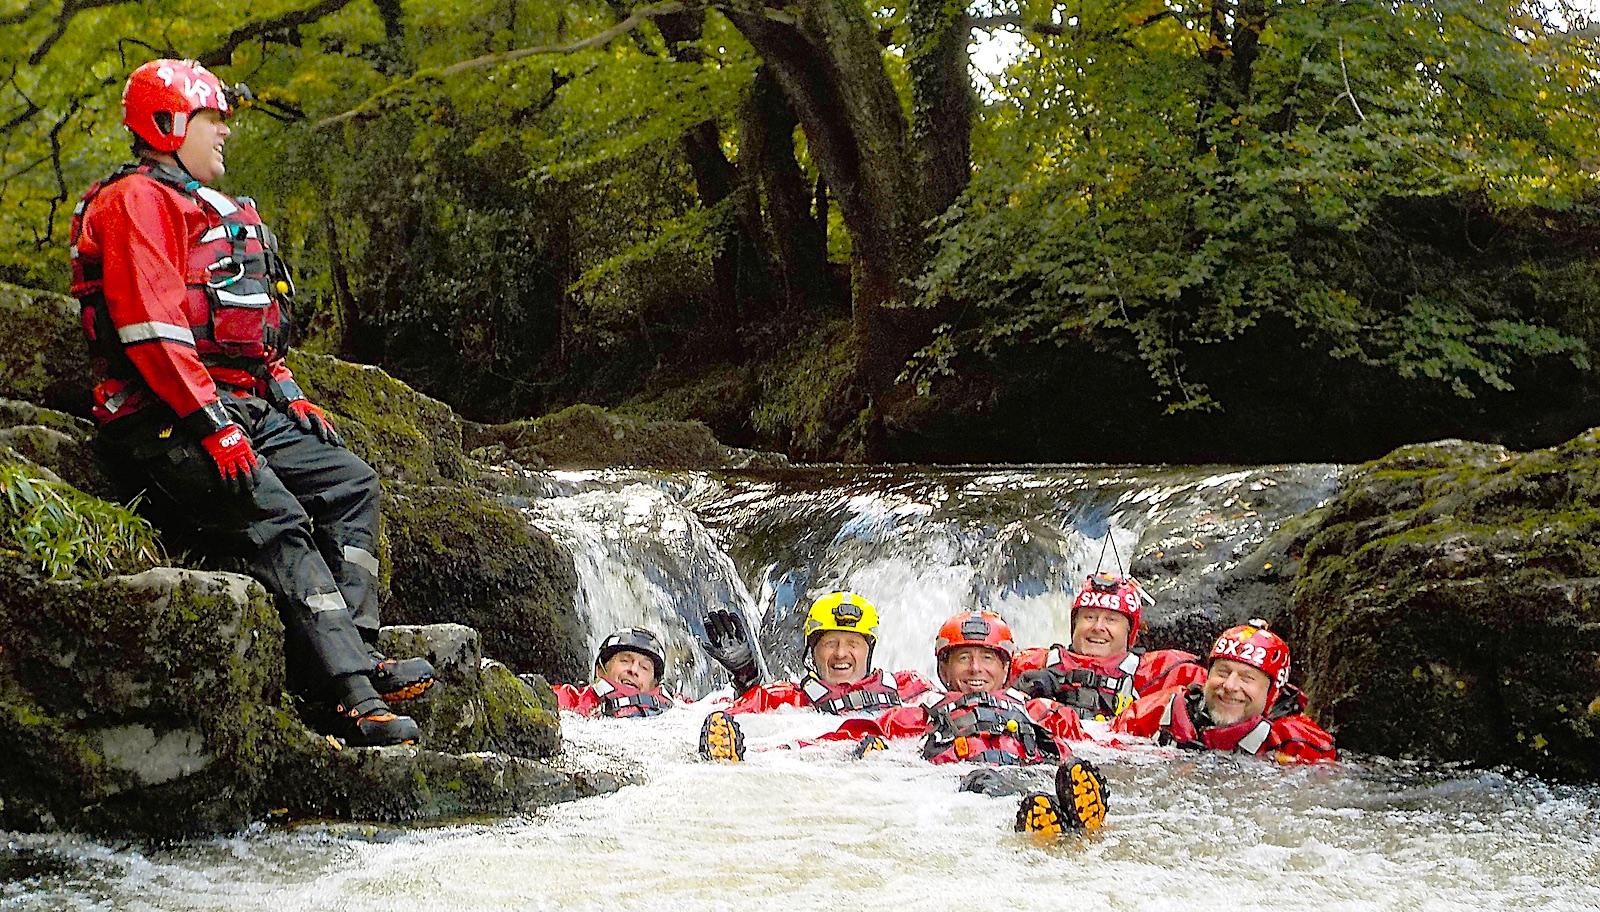 The water team sitting below a waterfall